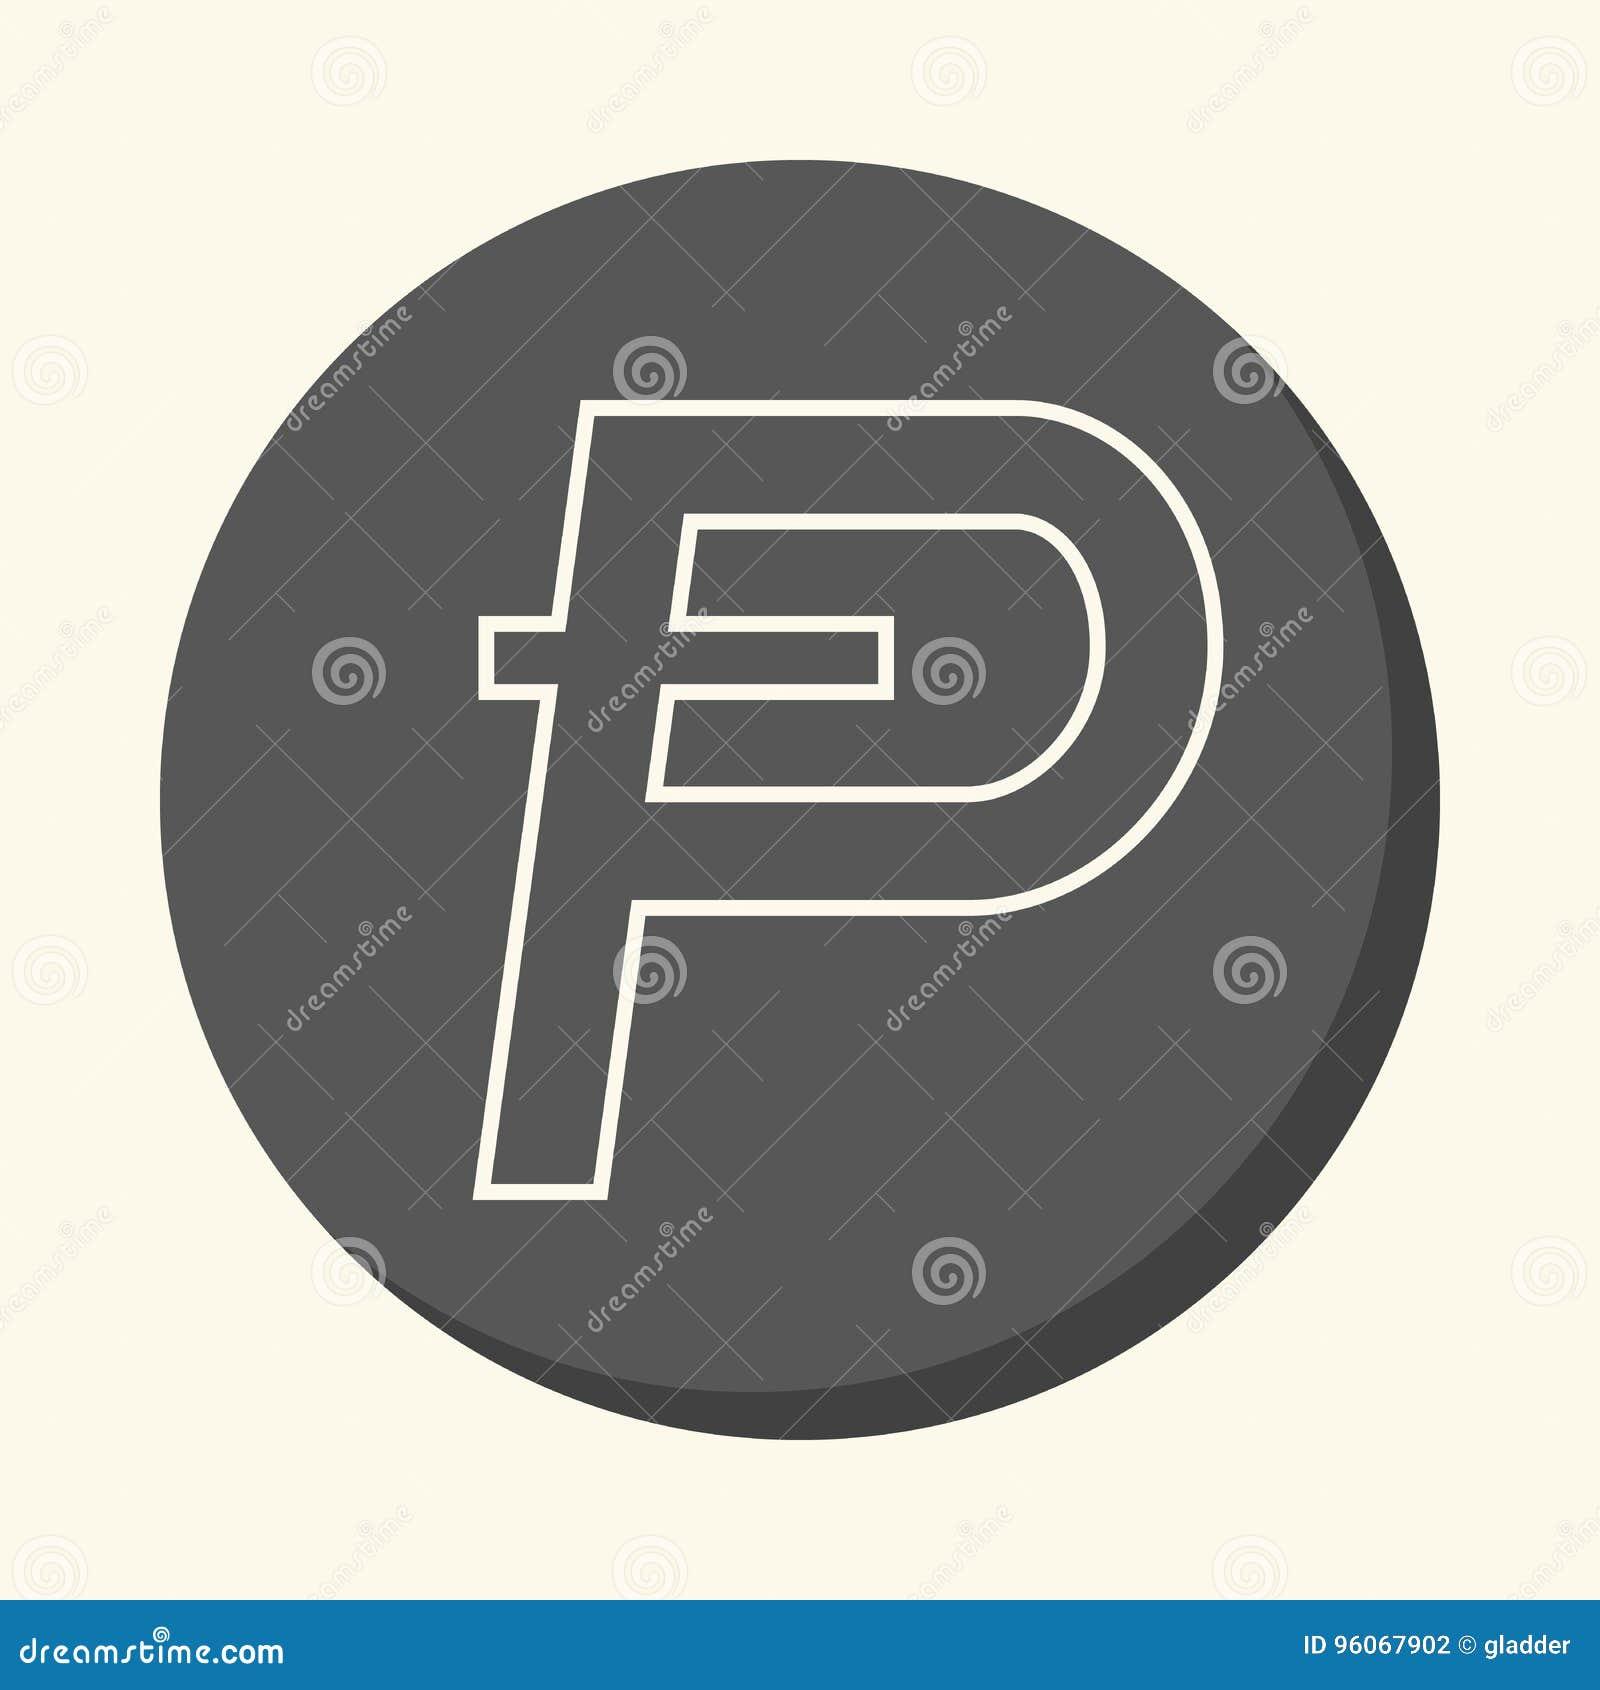 Symbool van digitale crypto munt Potcoin, rond lineair pictogram met illusie van volume, eenvoudige kleurenverandering